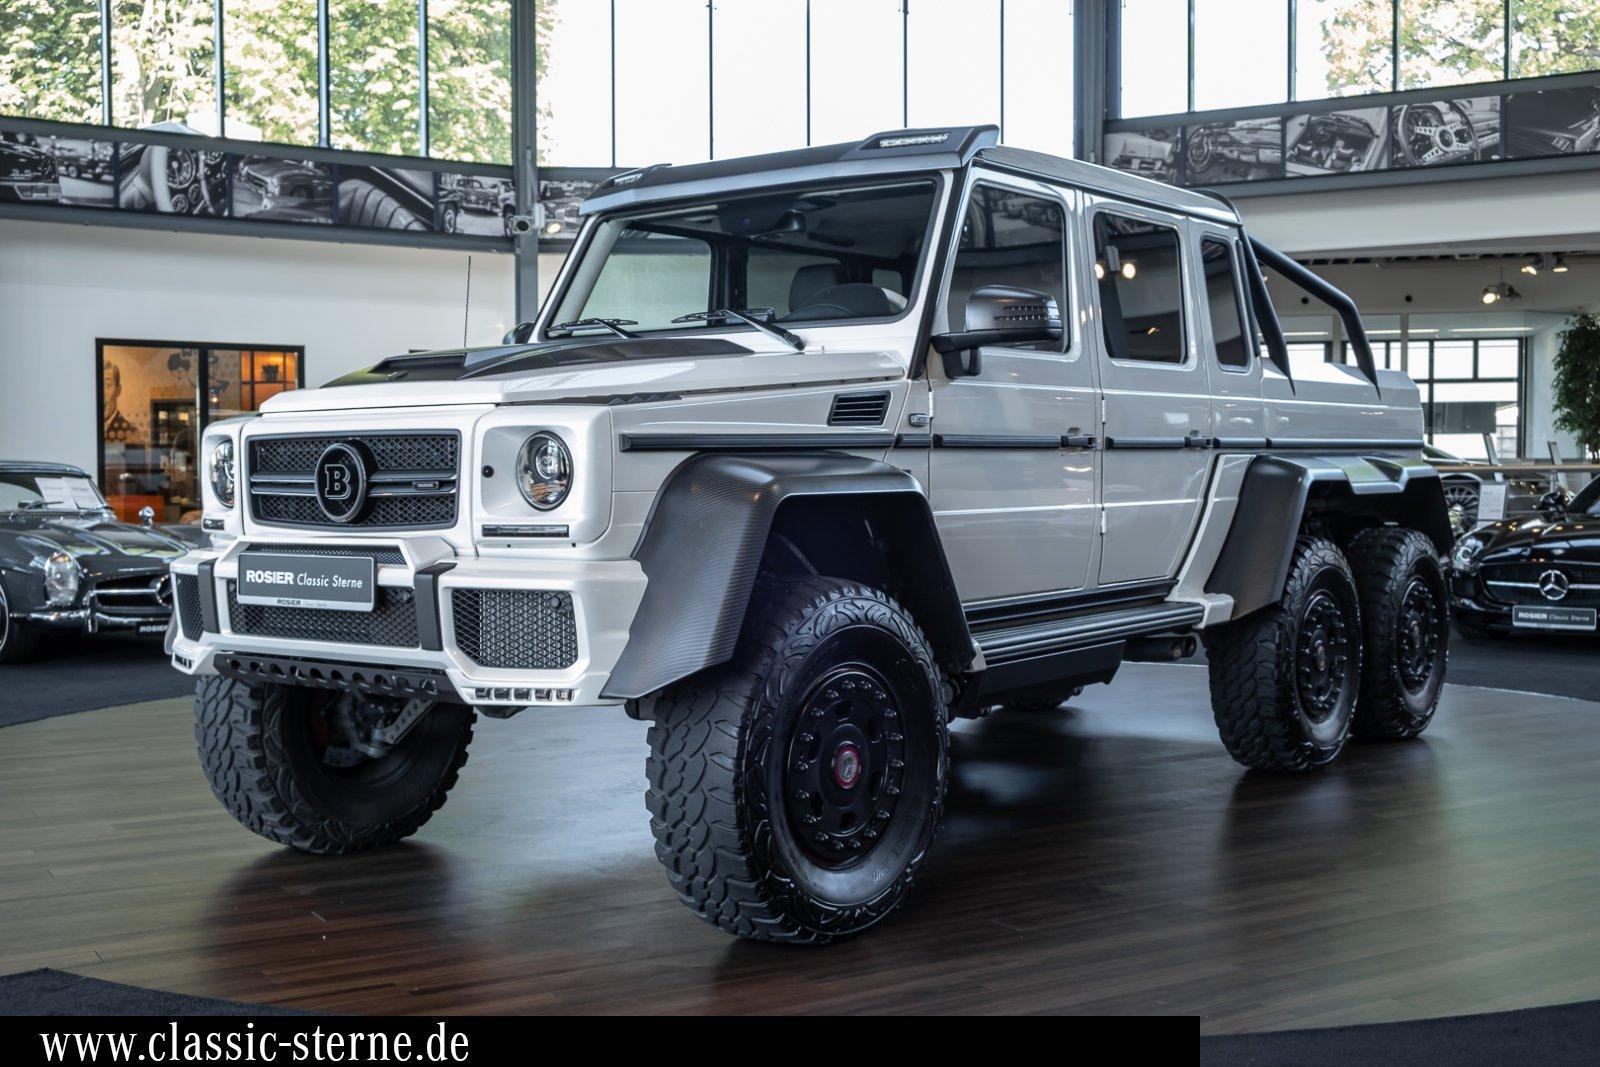 2014 Mercedes Benz G Class G 63 Amg 6x6 Brabus White White Exclusive Classic Driver Market